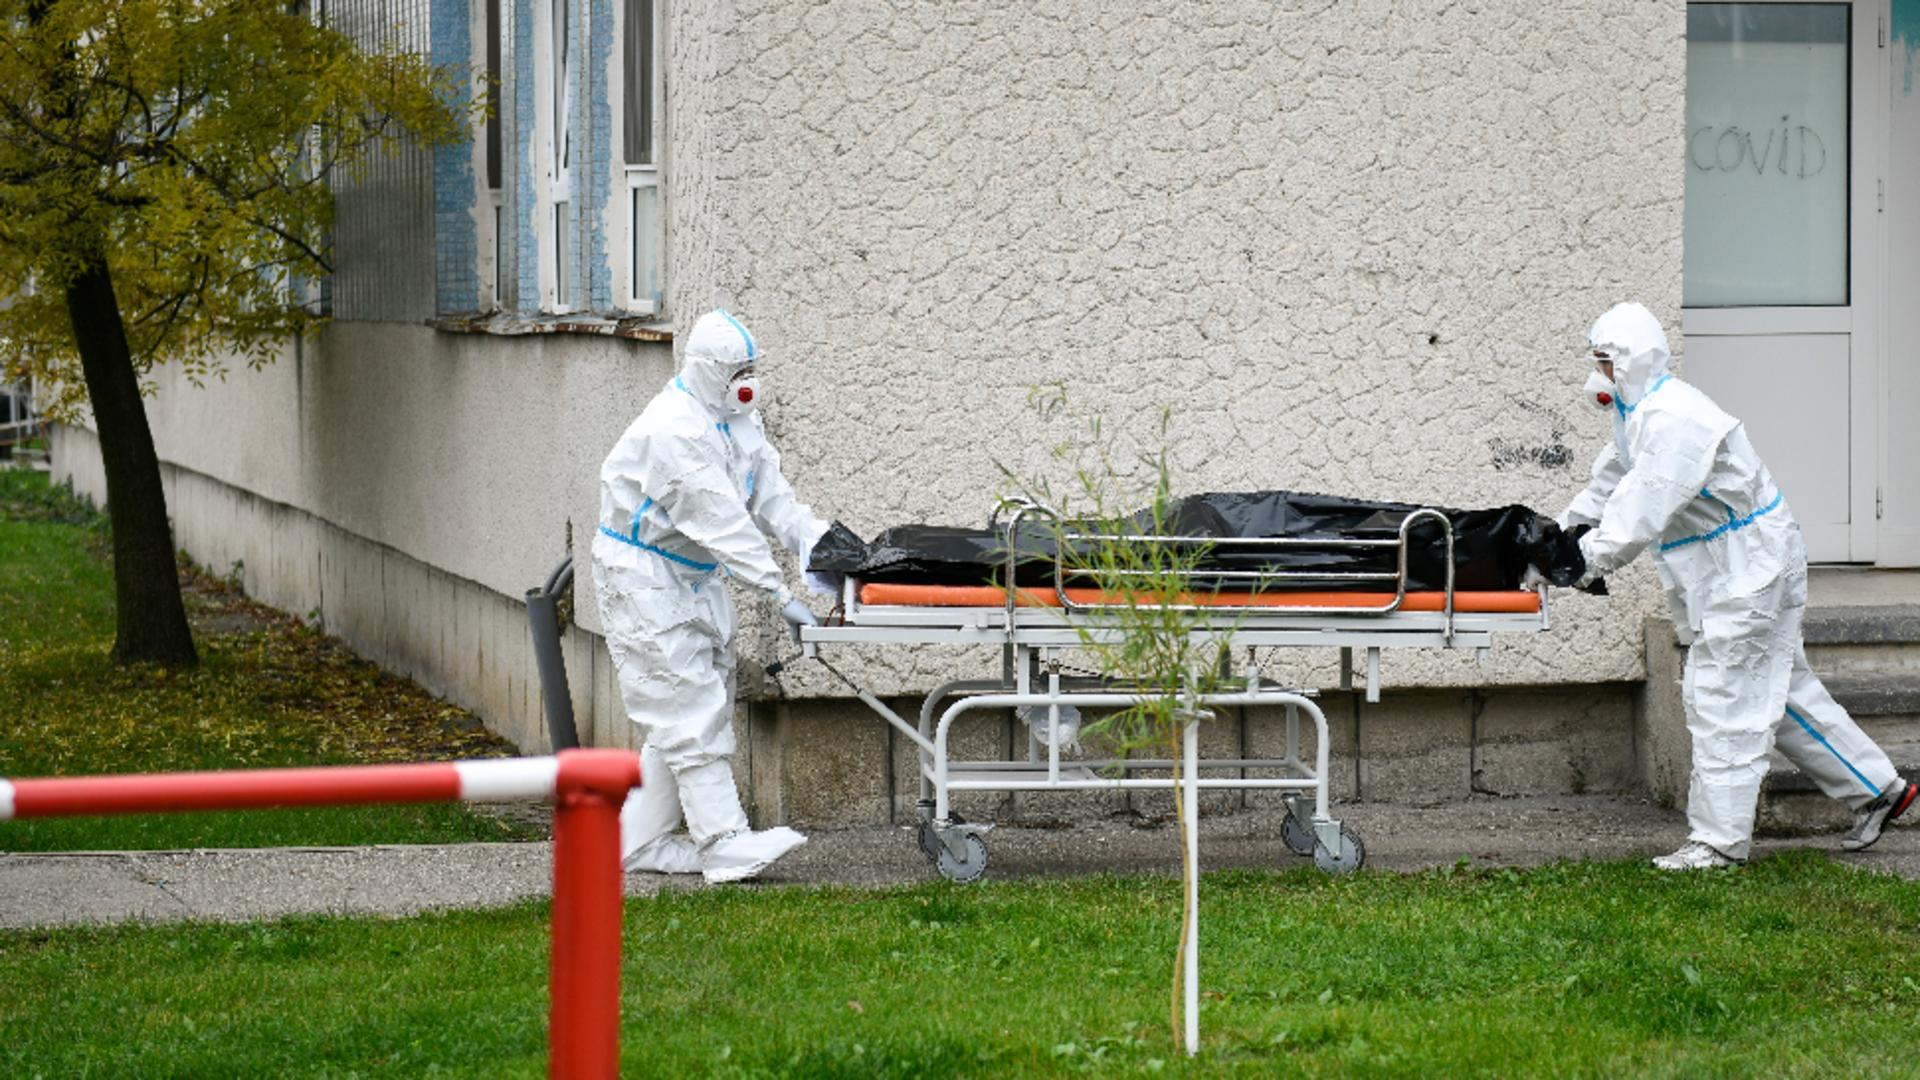 Epidemiolog român, avertisment tulburător pentru valul 4: Va fi ca un TSUNAMI / Foto: Inquam Photos